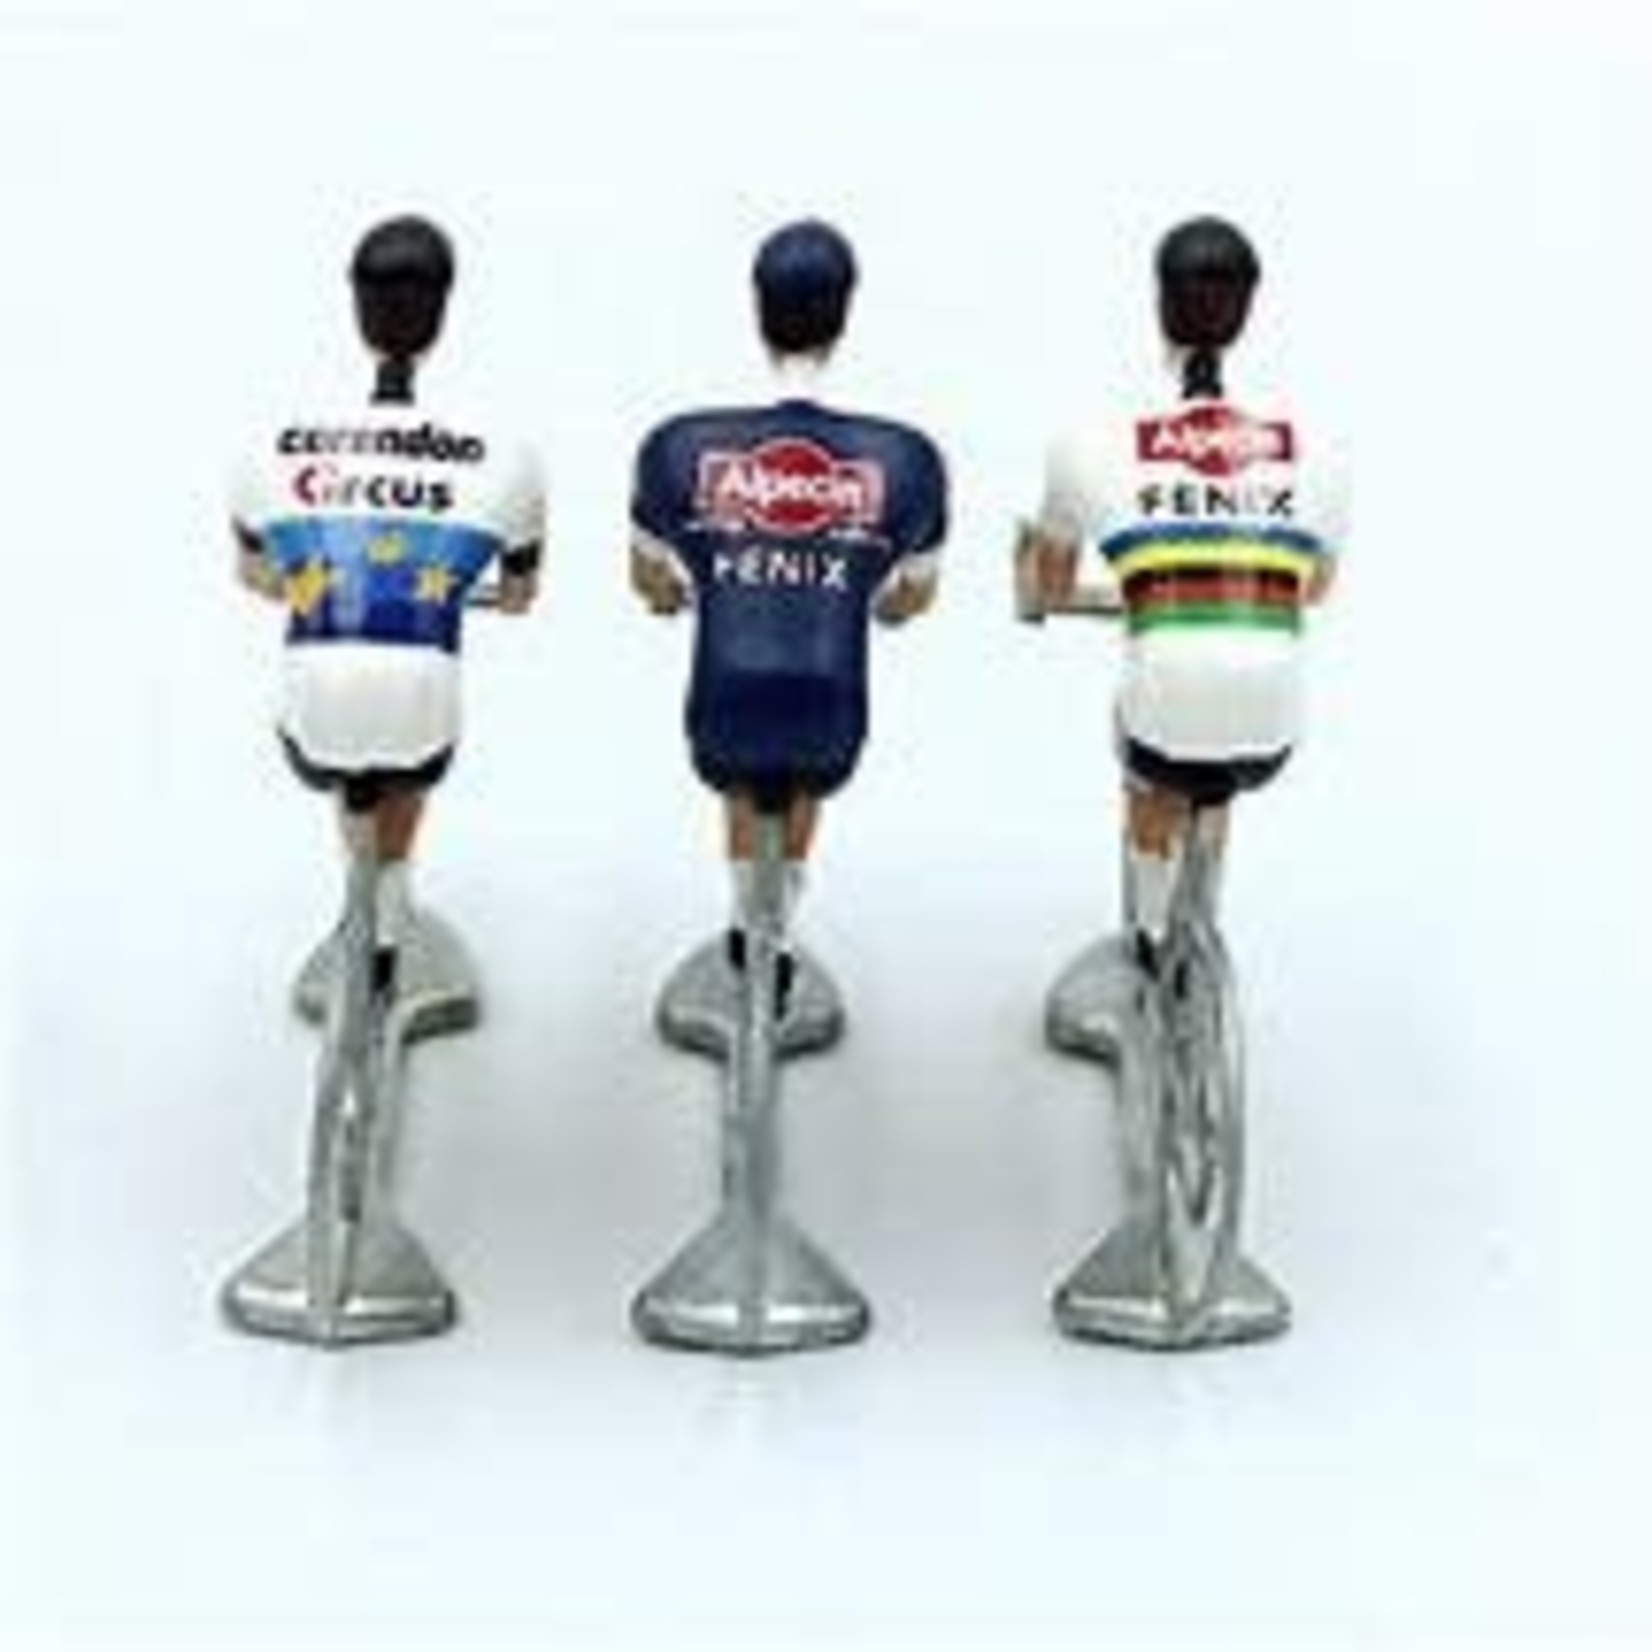 Miniature cyclist 'Cycling hero's Mathieu VDP' (3stuks)